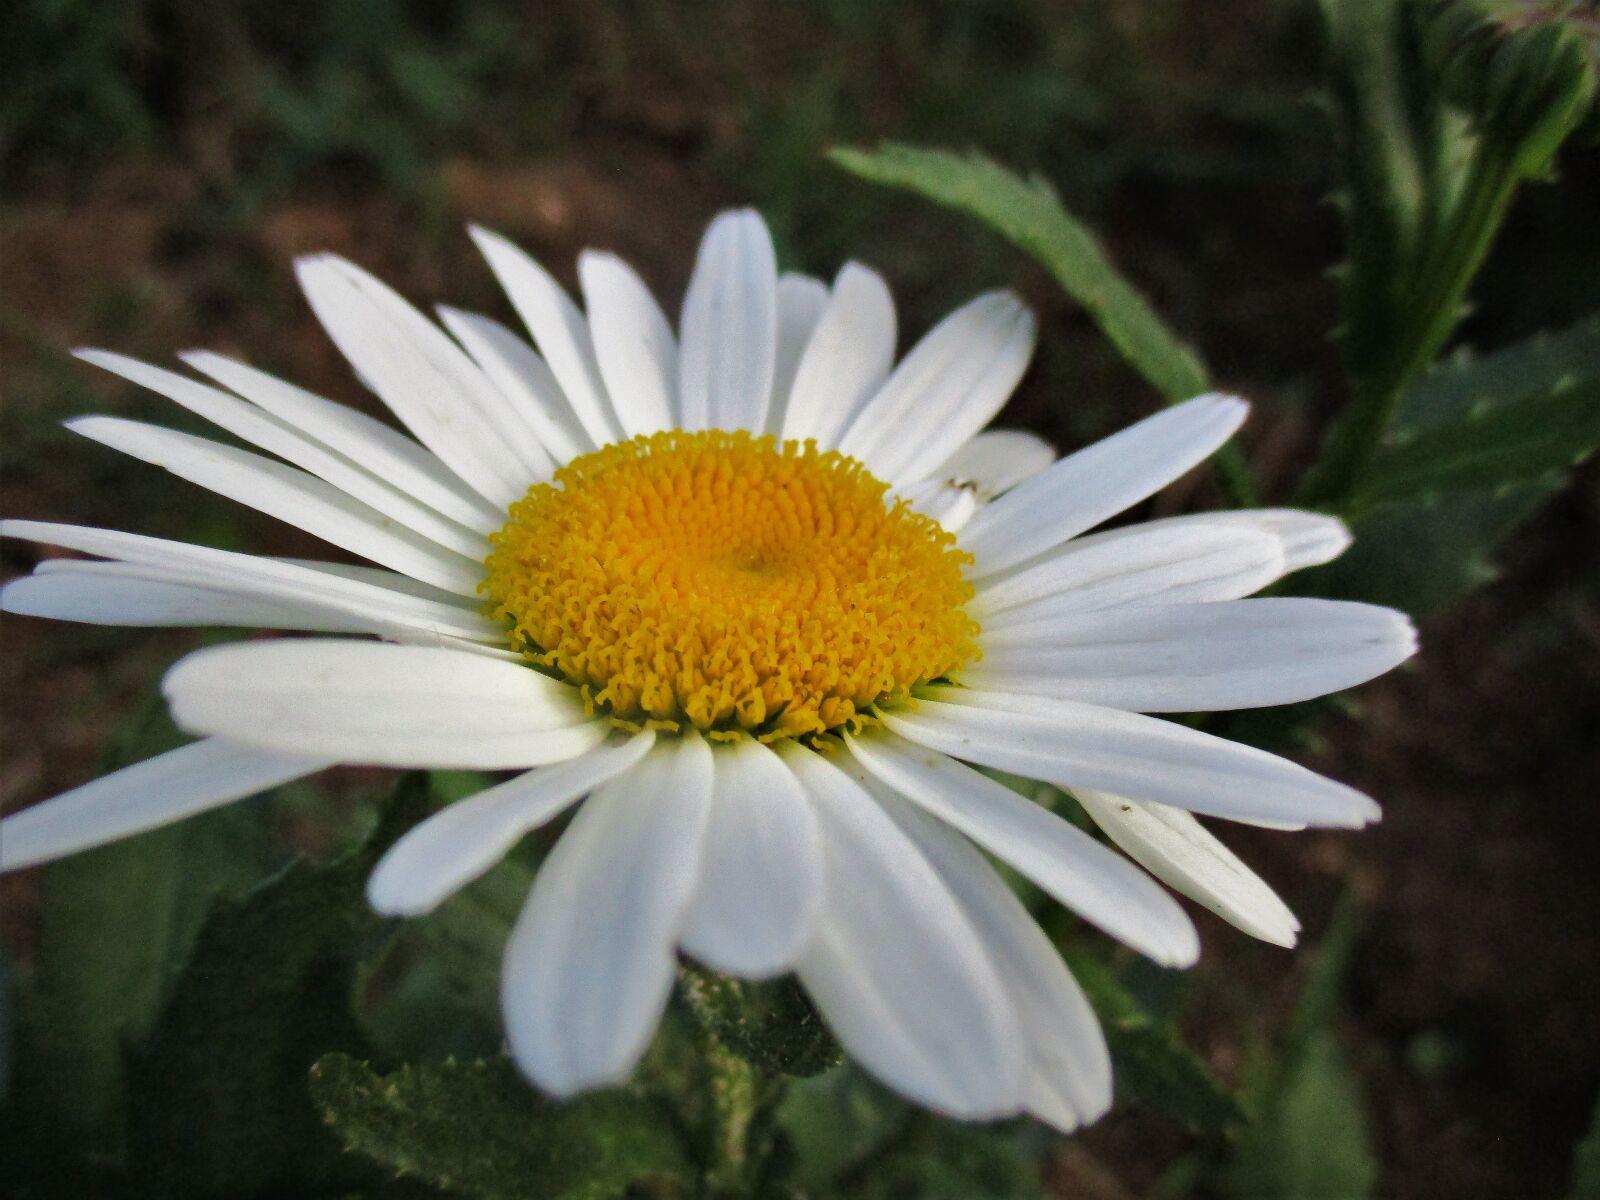 daisy, flower, spring